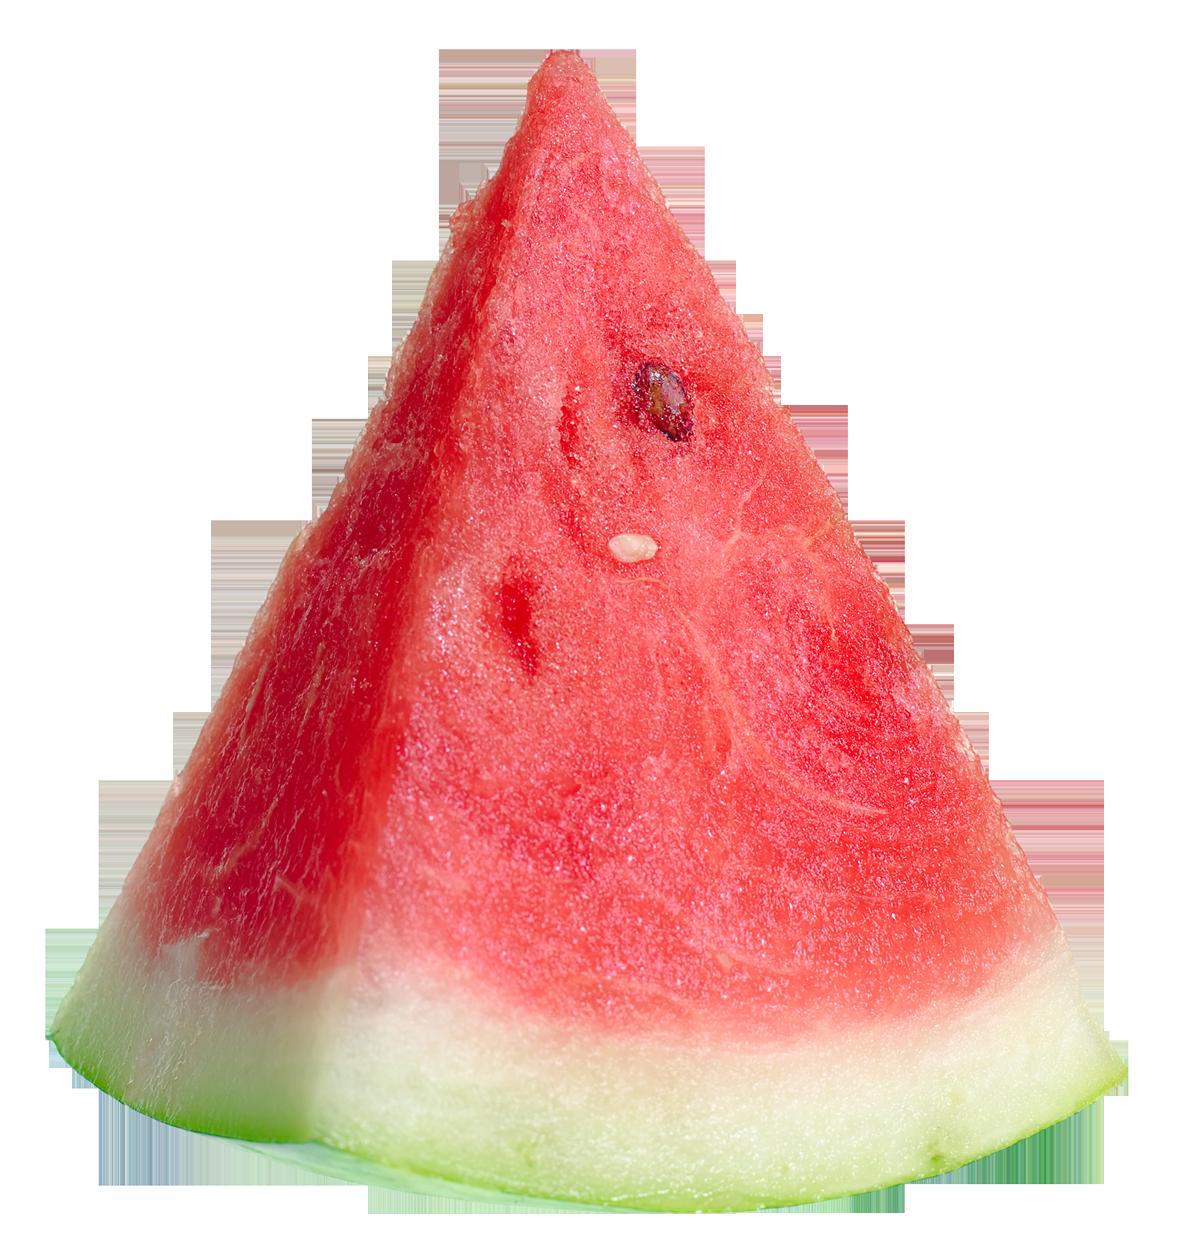 Watermelon Slice Png Image Fruit Nutrition Watermelon Fruit